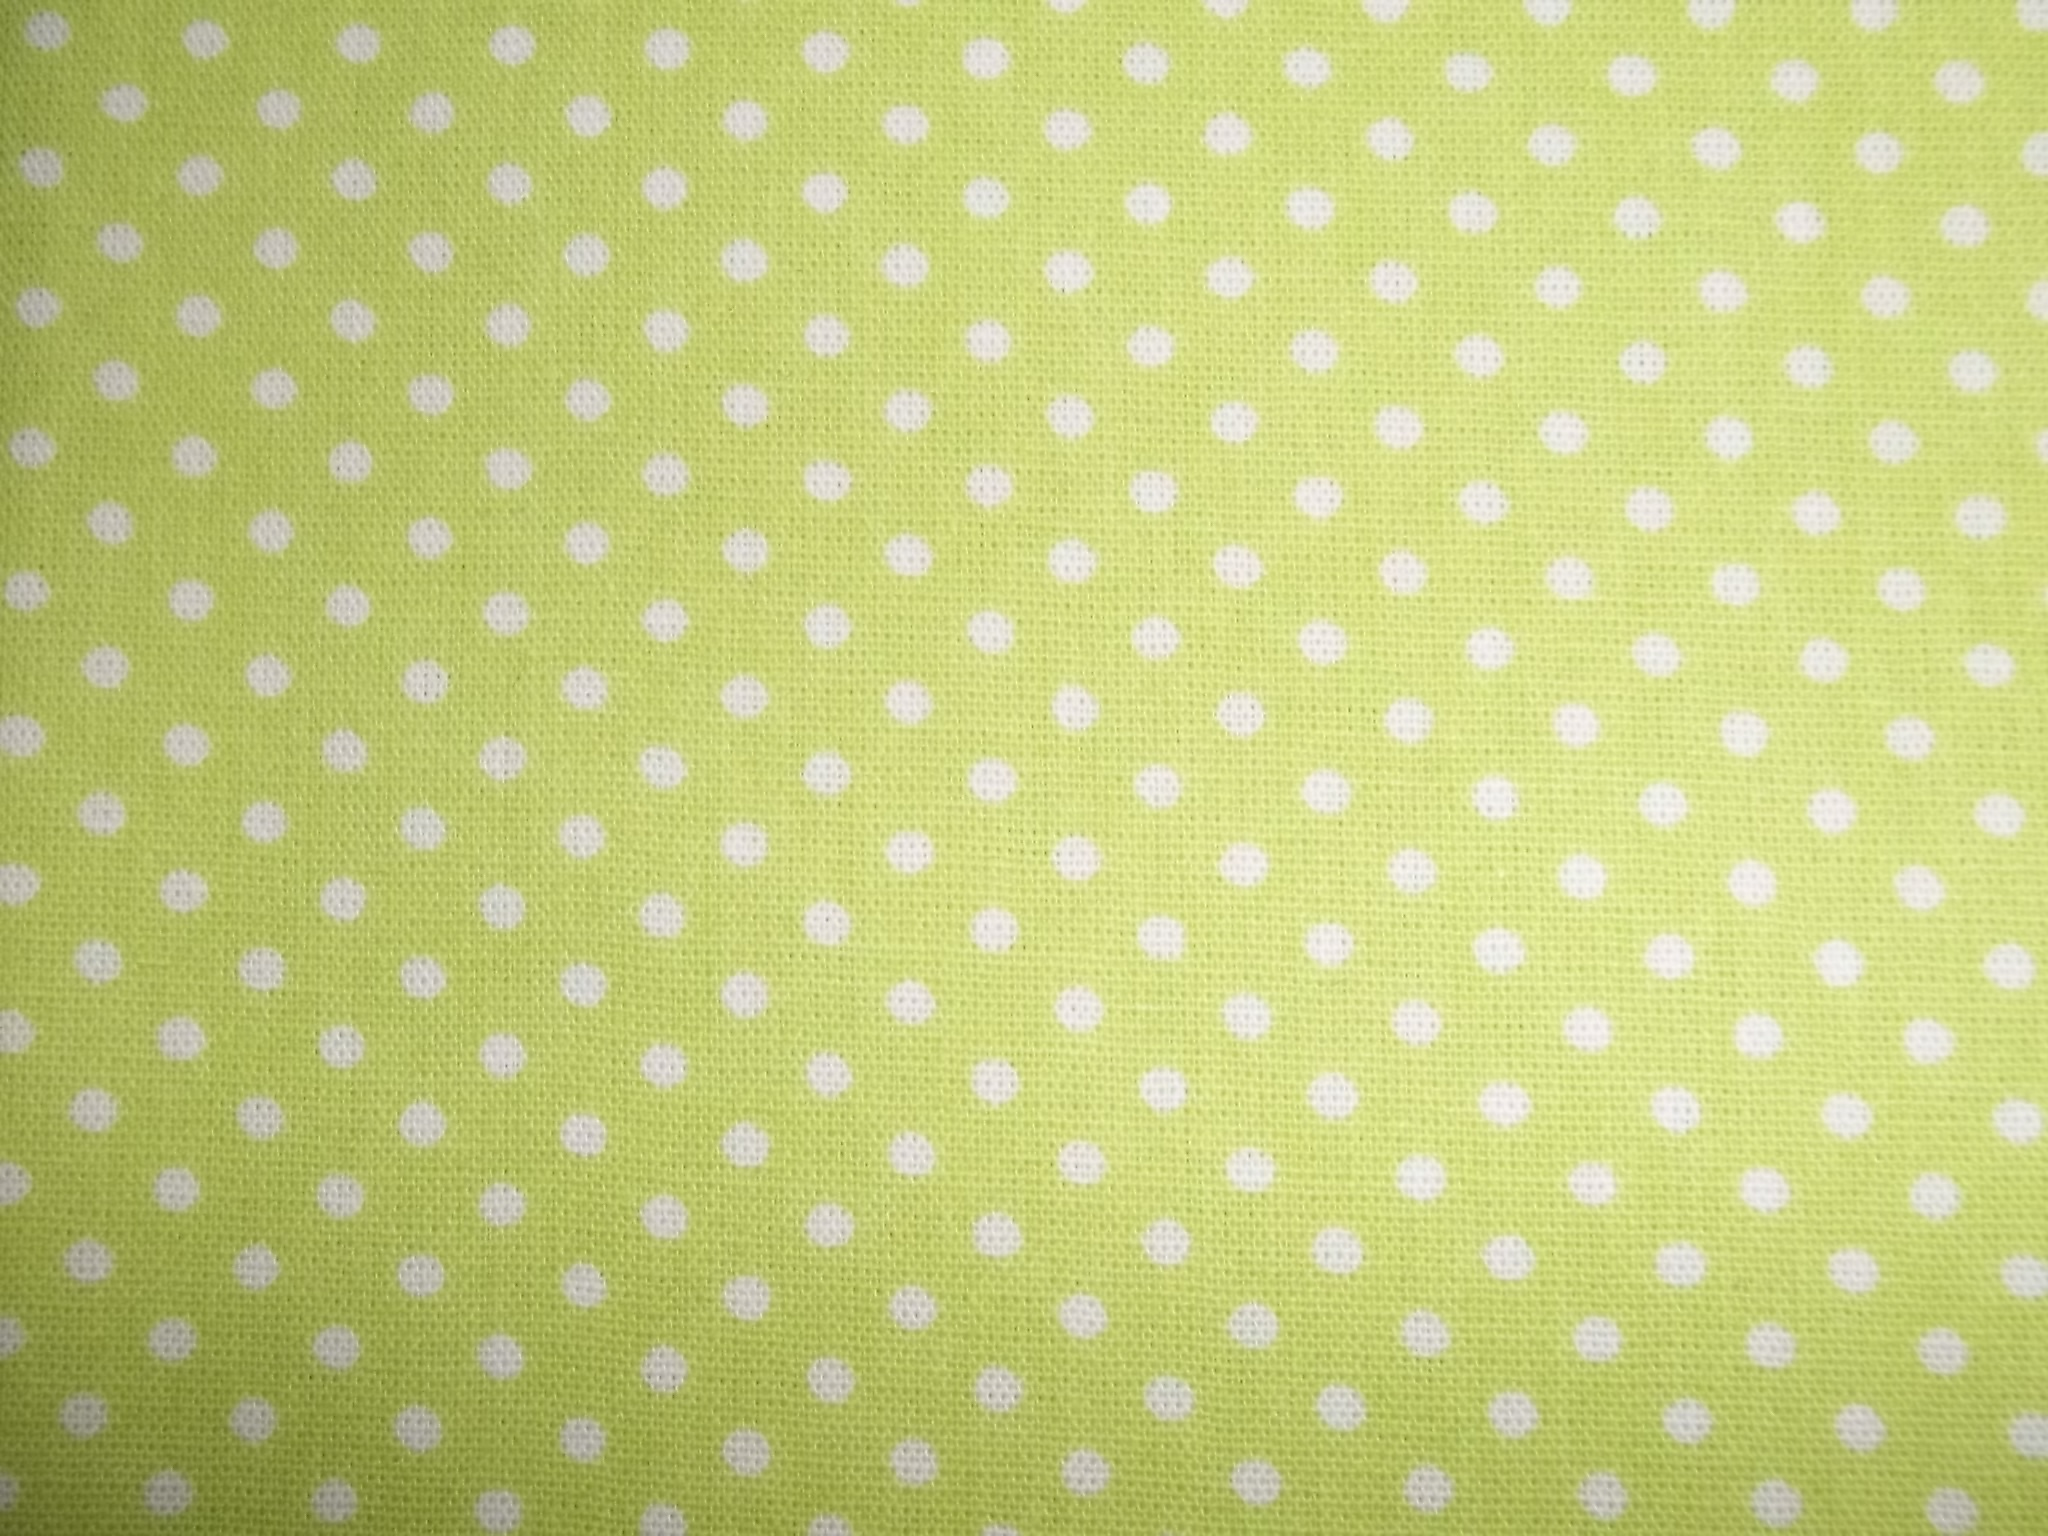 Verde e Branco Wallpaper Tecido 003 Verde Claro c/